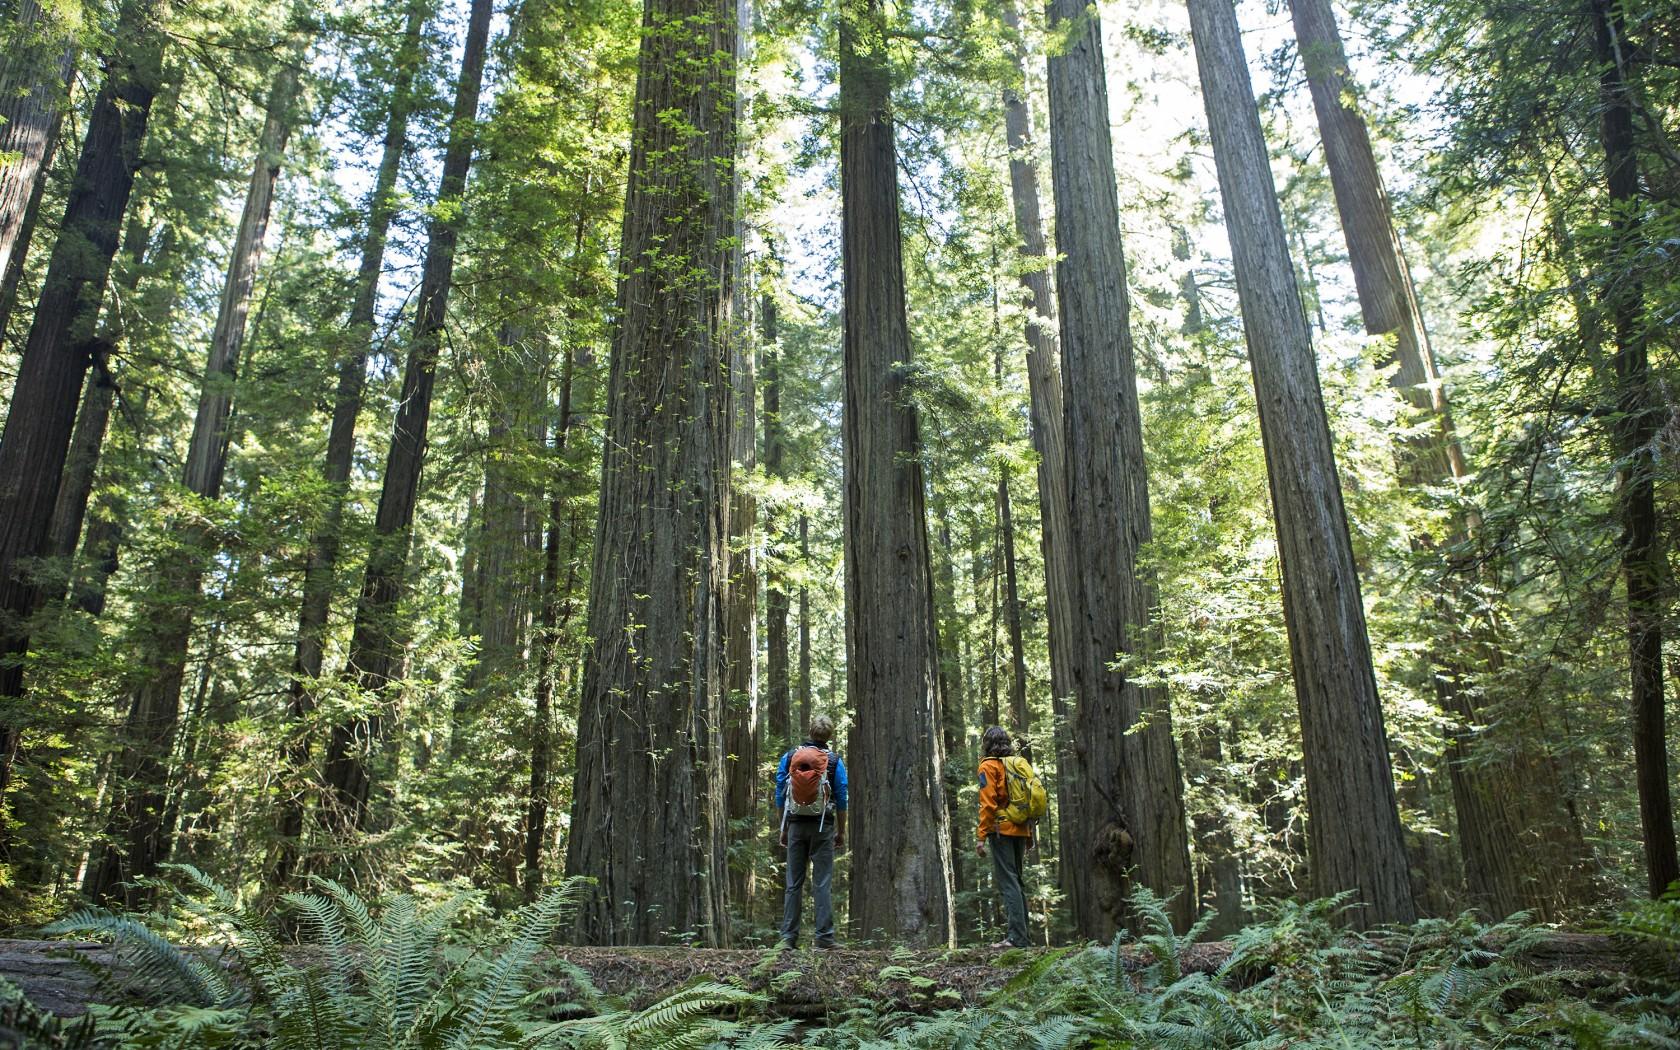 2Overs-Giant-Redwoods-157952770-1680x1050